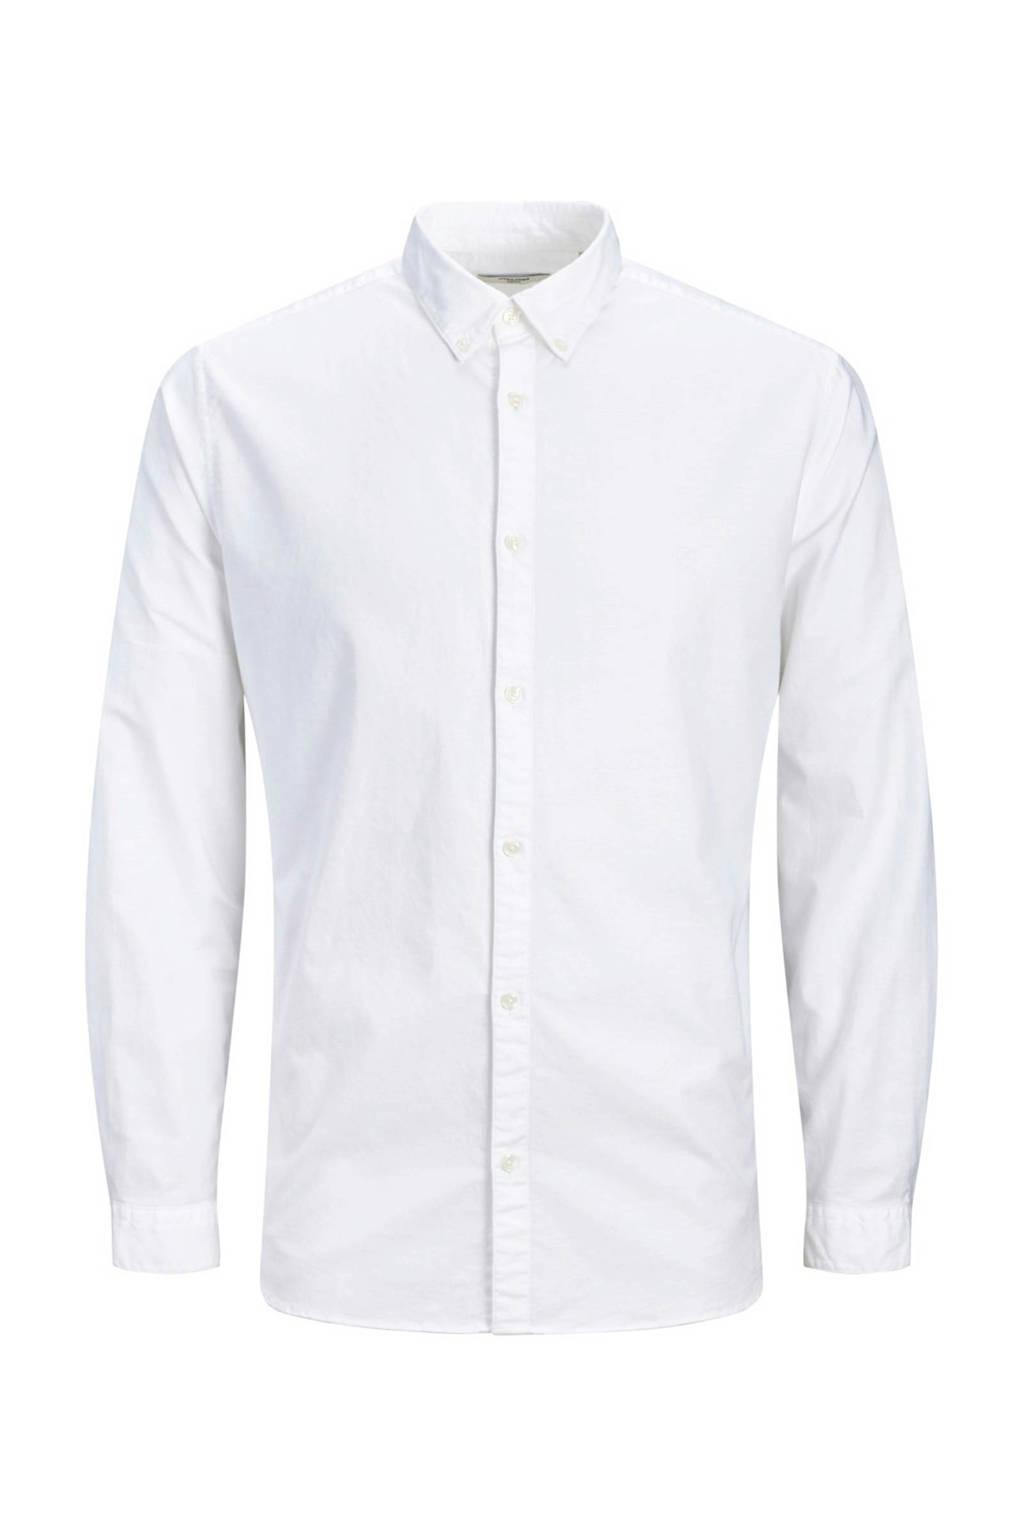 Jack & Jones Premium overhemd, Wit